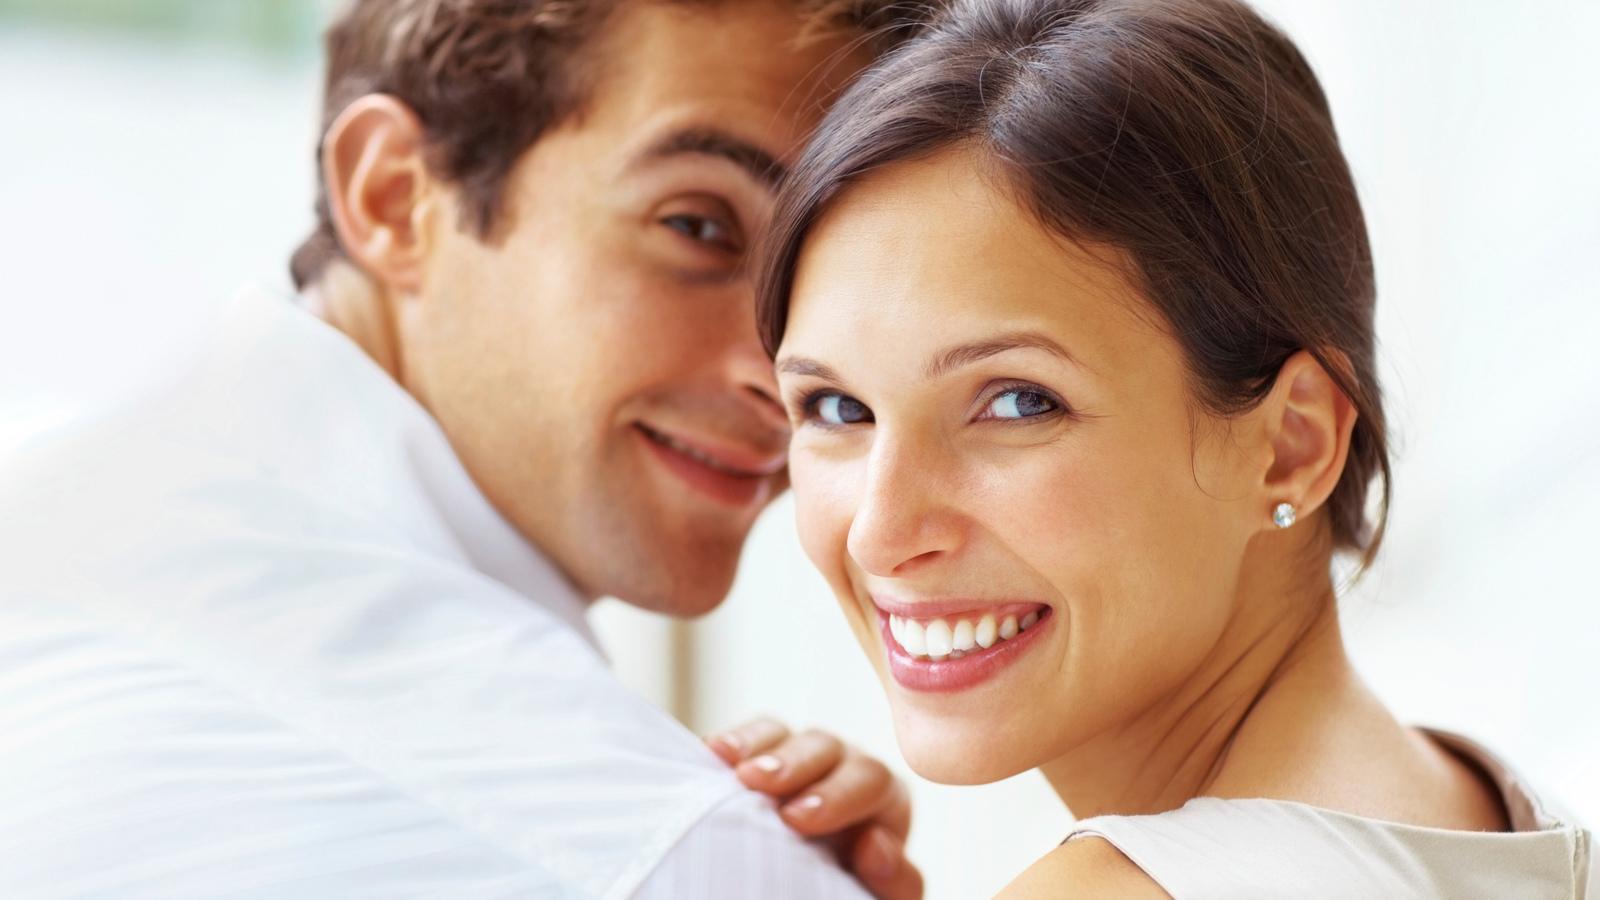 Трахнул продавщицу молодая пара муж и жена настя